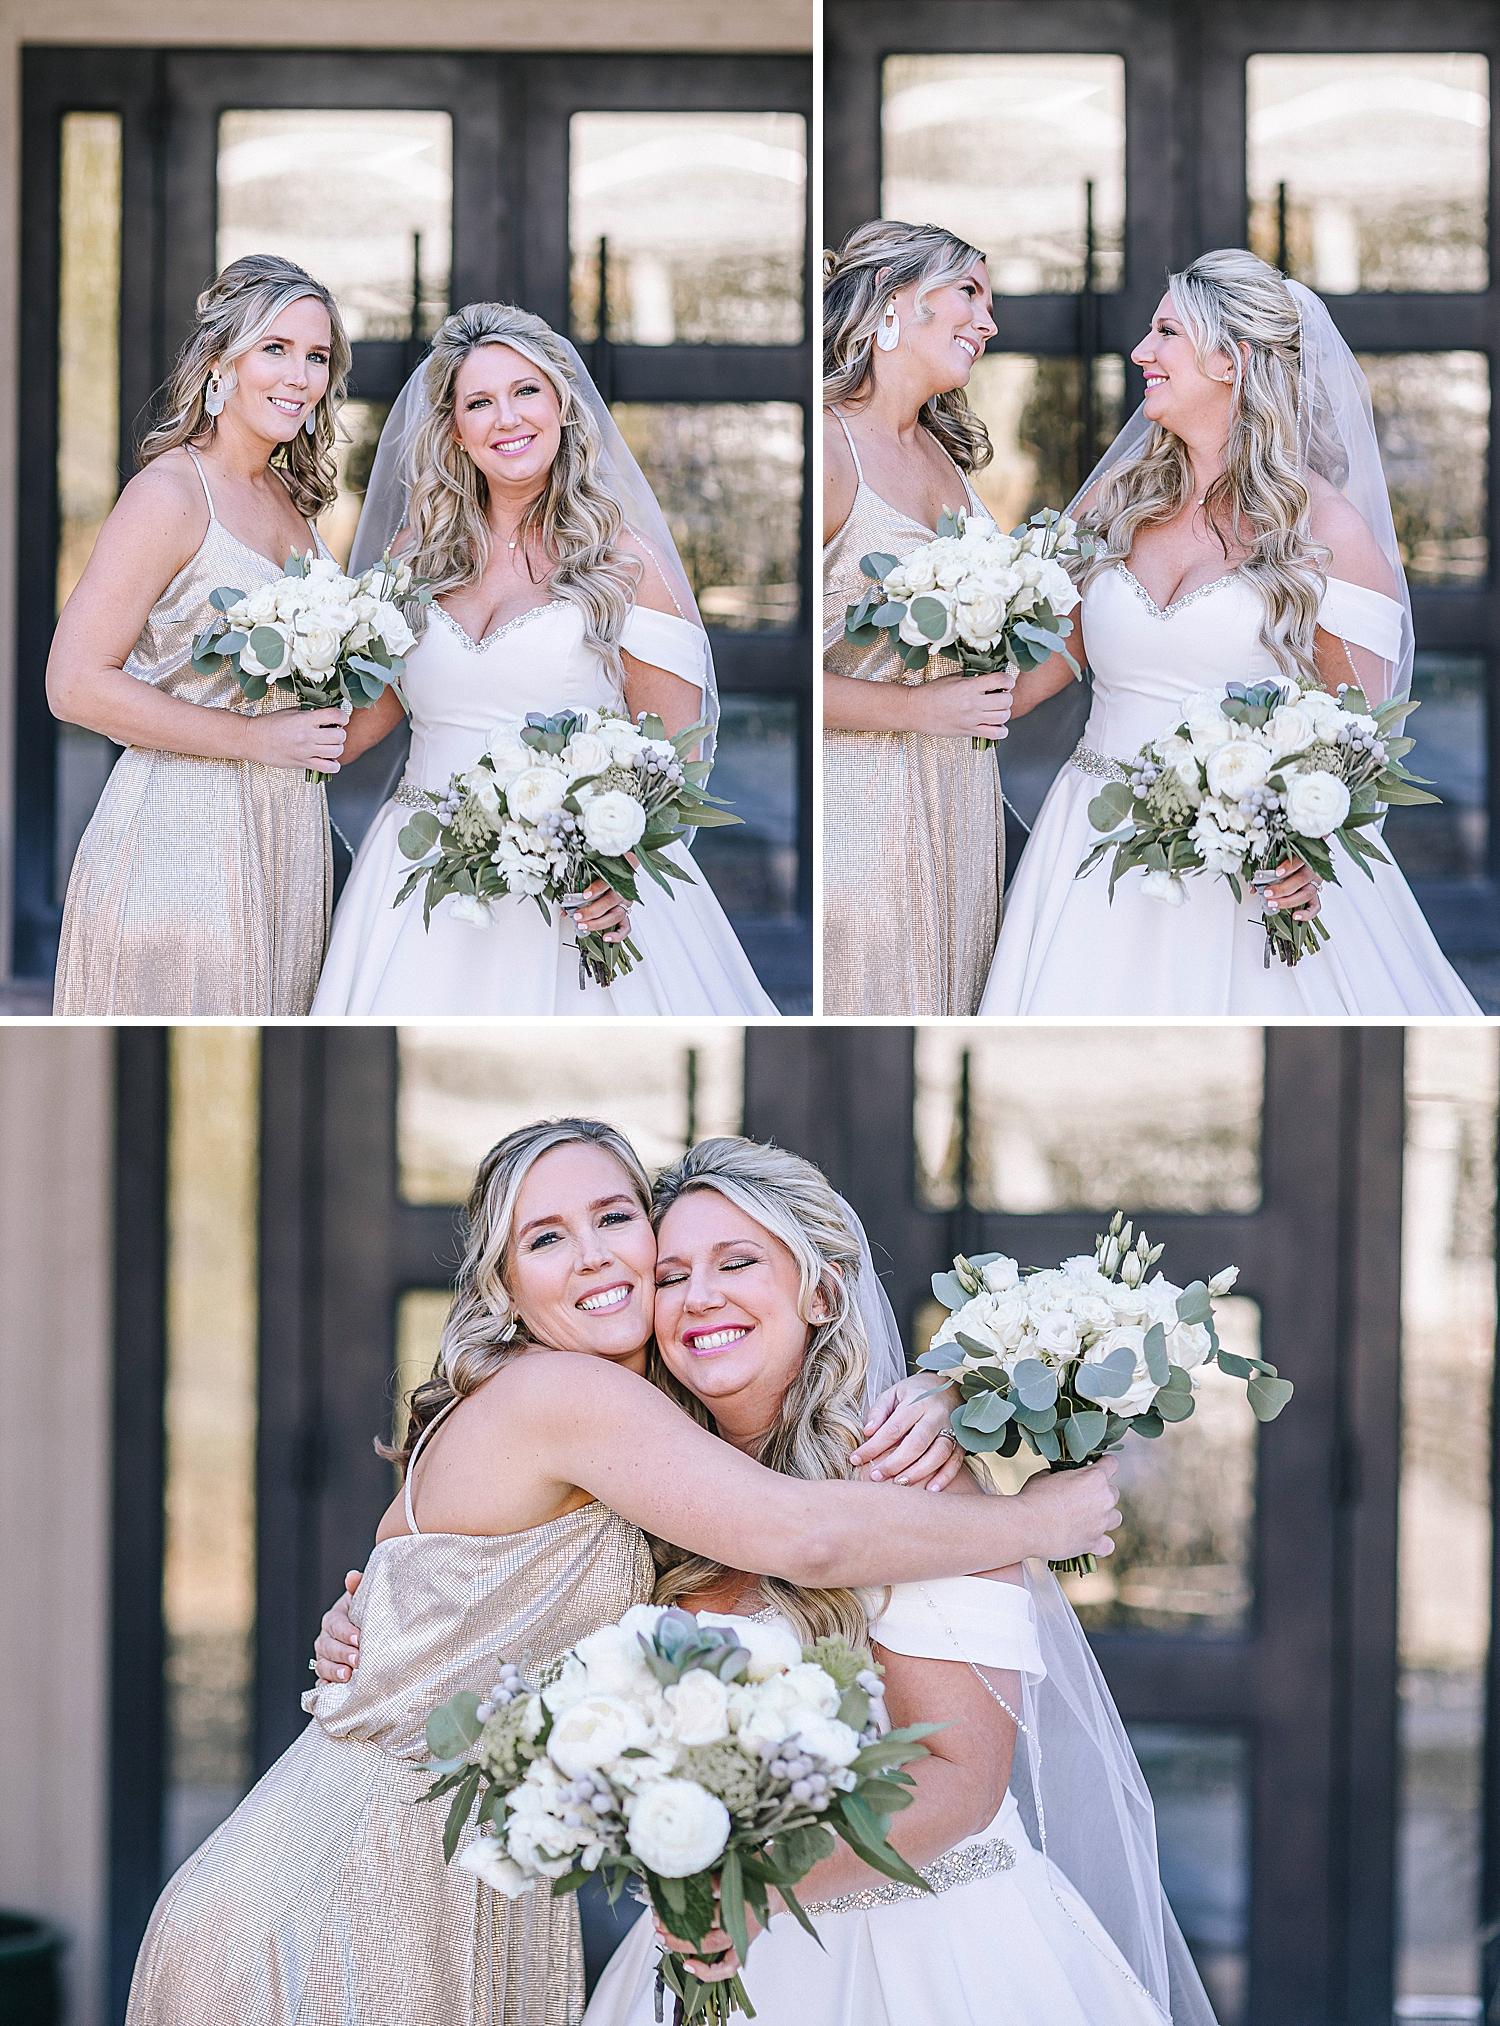 Magnolia-Halle-Wedding-San-Antonio-Texas-Bride-Grom_0035.jpg